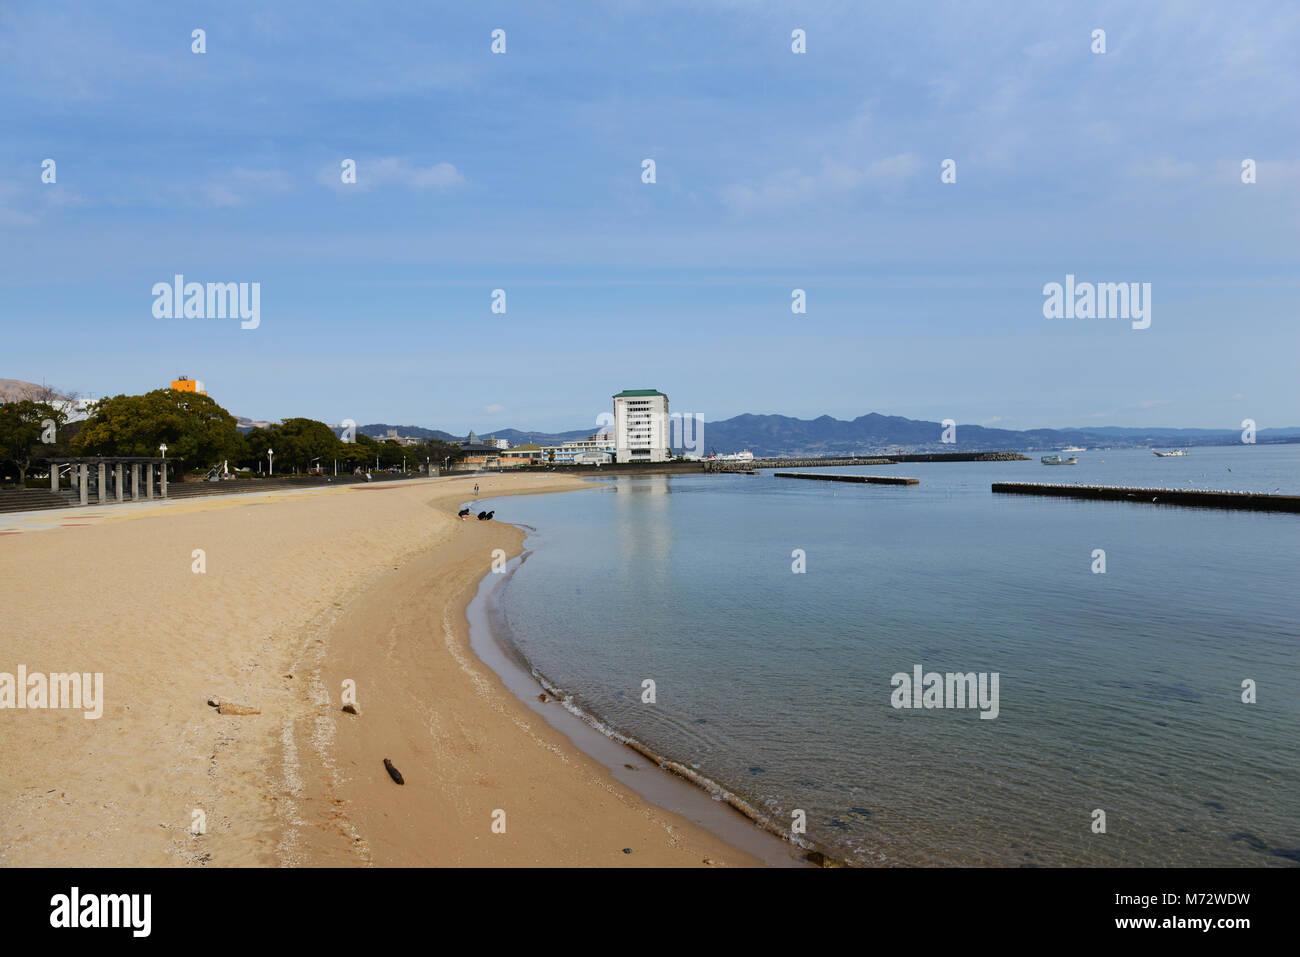 The beach in Beppu, Japan. - Stock Image